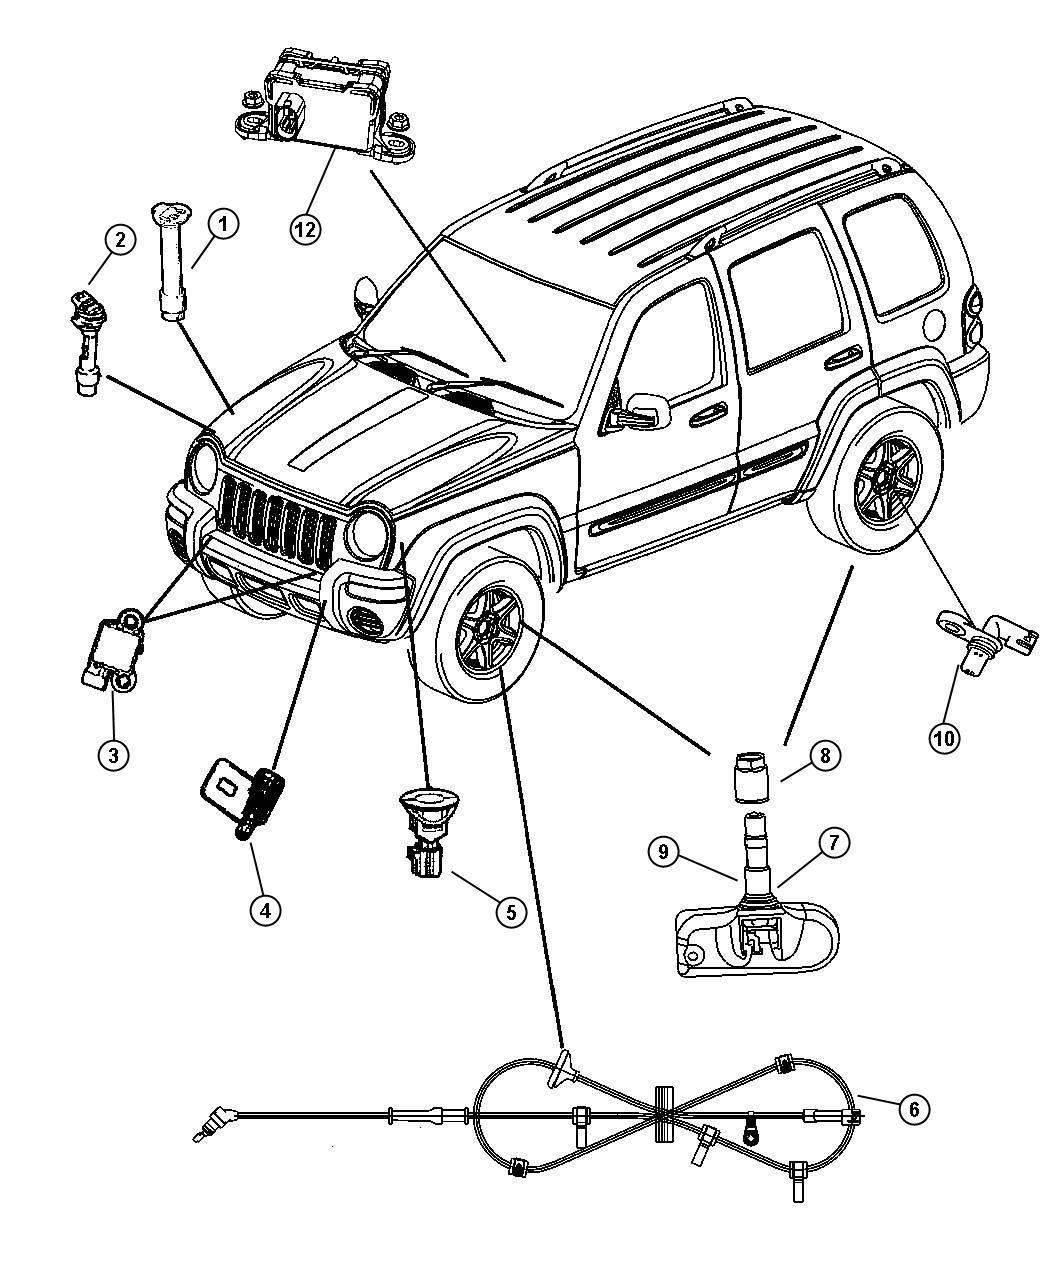 2007 Jeep Liberty Sensor. Anti-lock brakes. Right